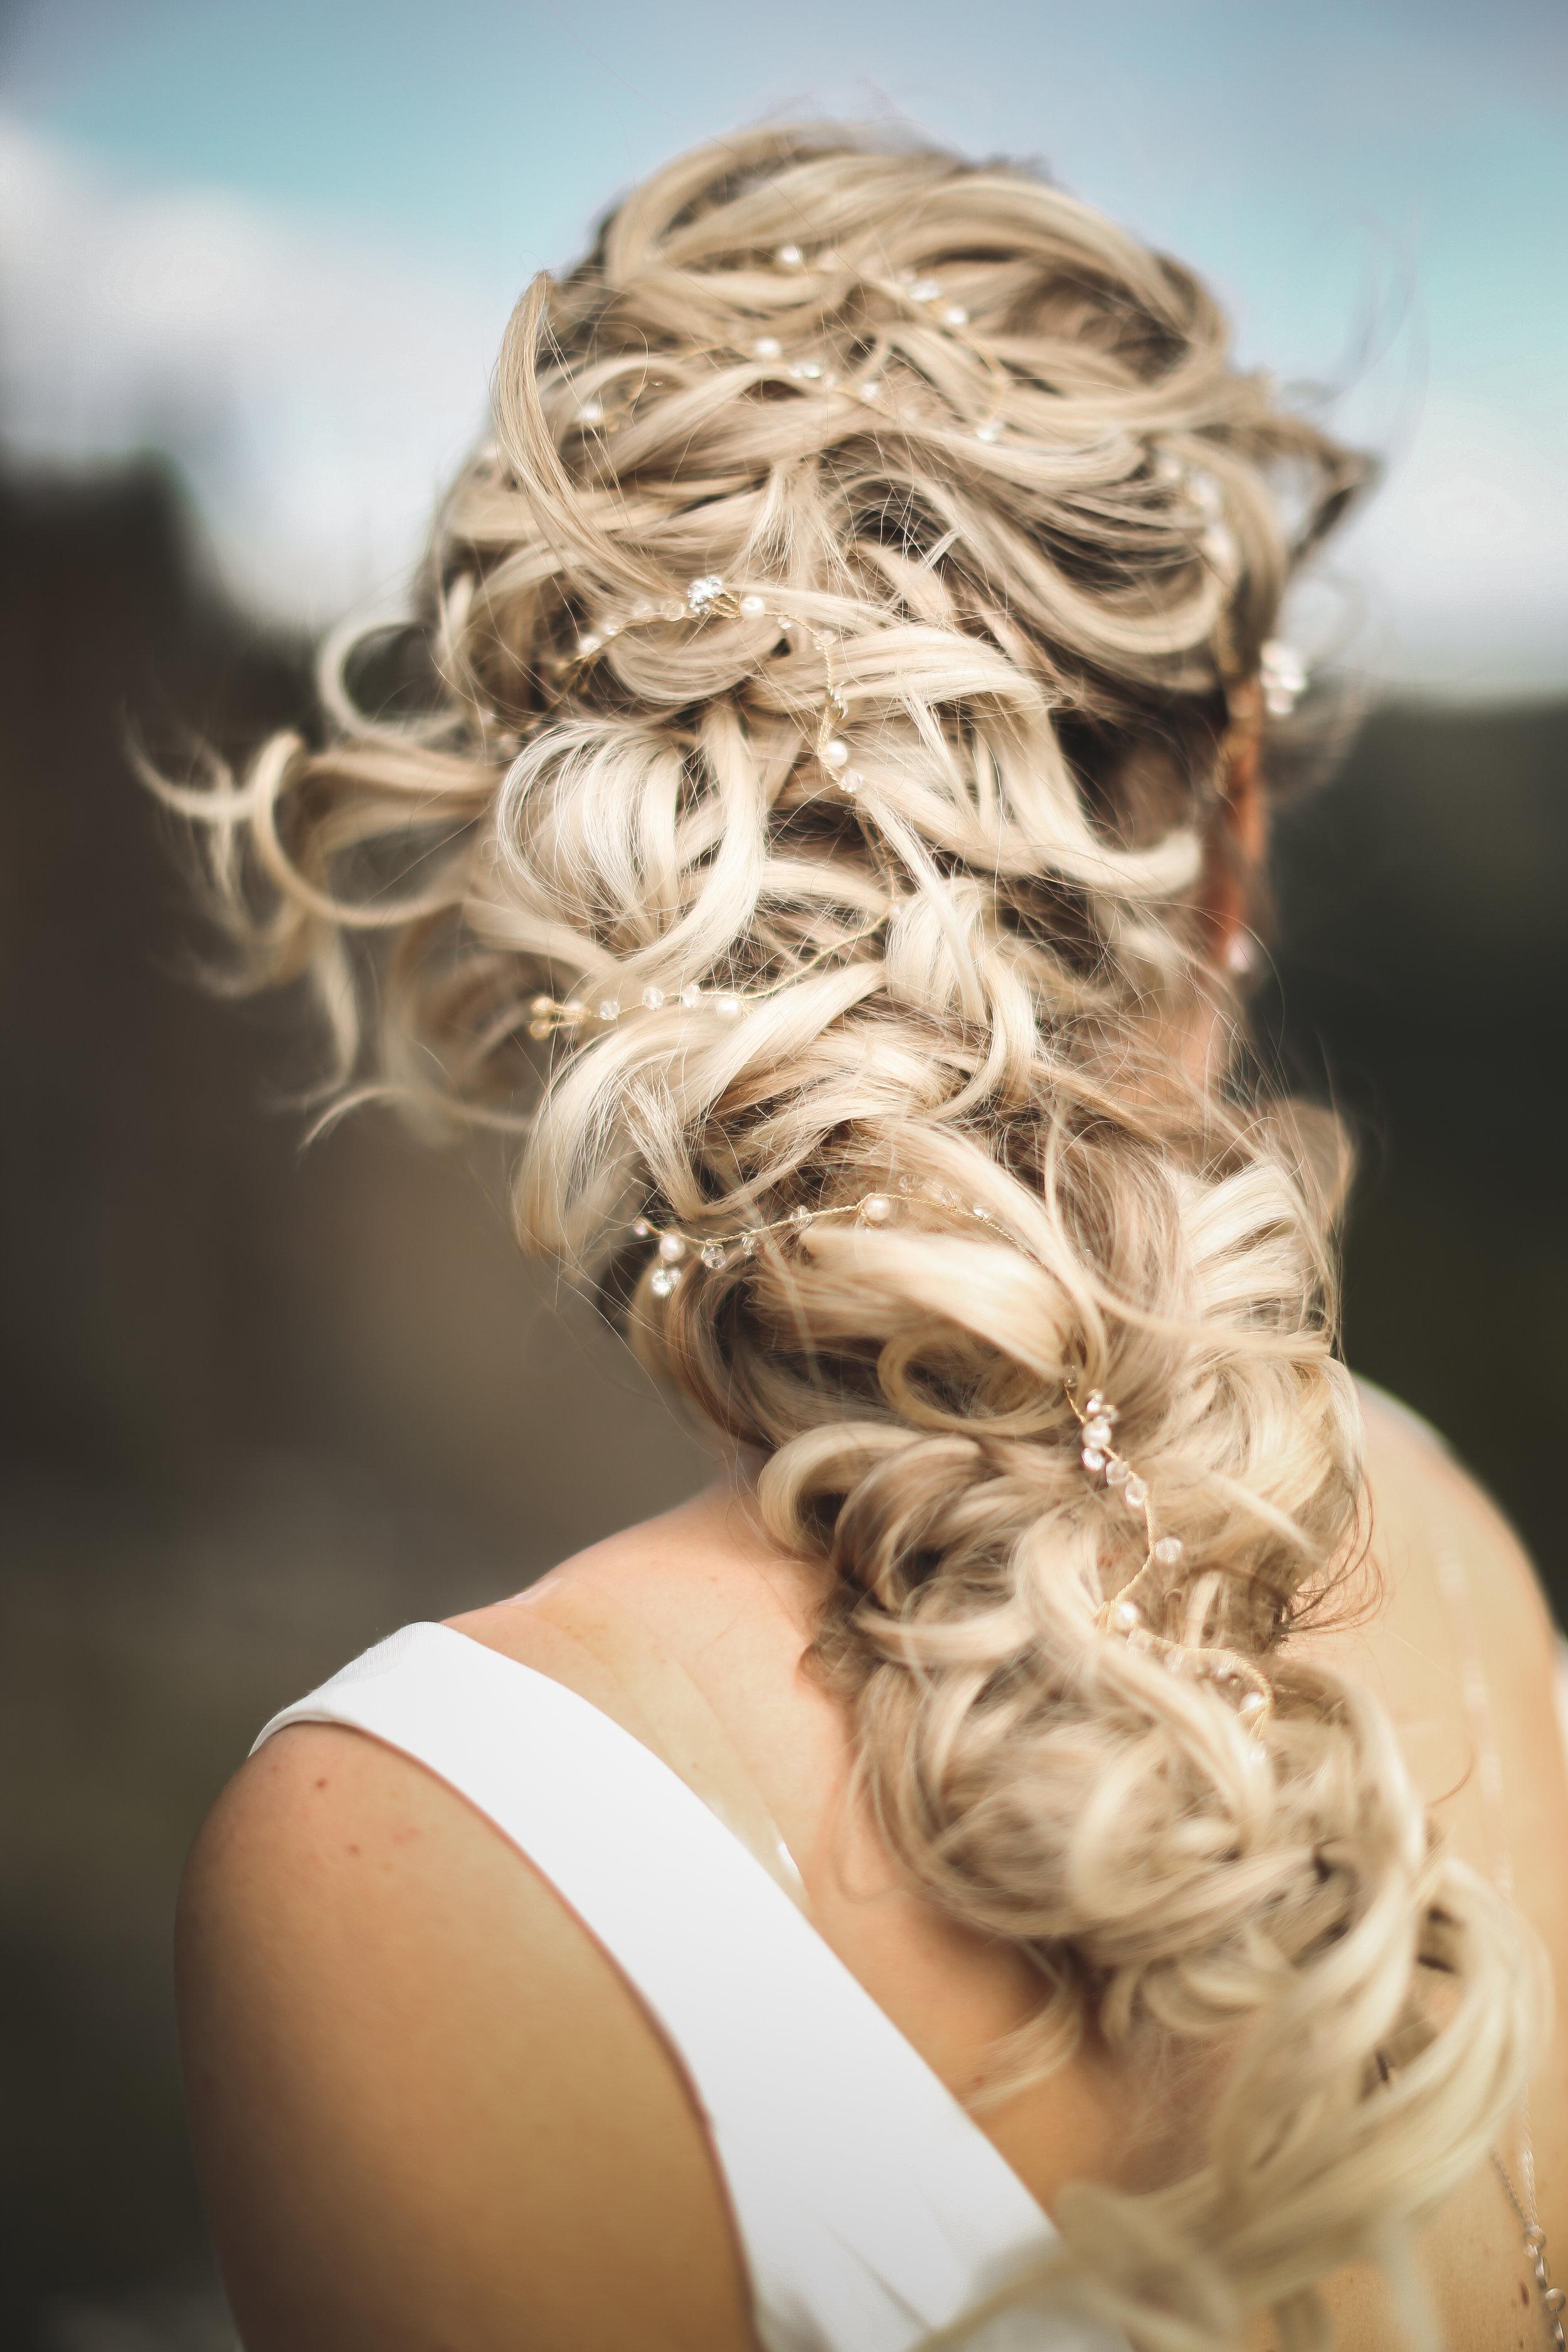 10 Adam Ziorio Photography - Kate & Ben's Wedding.jpg